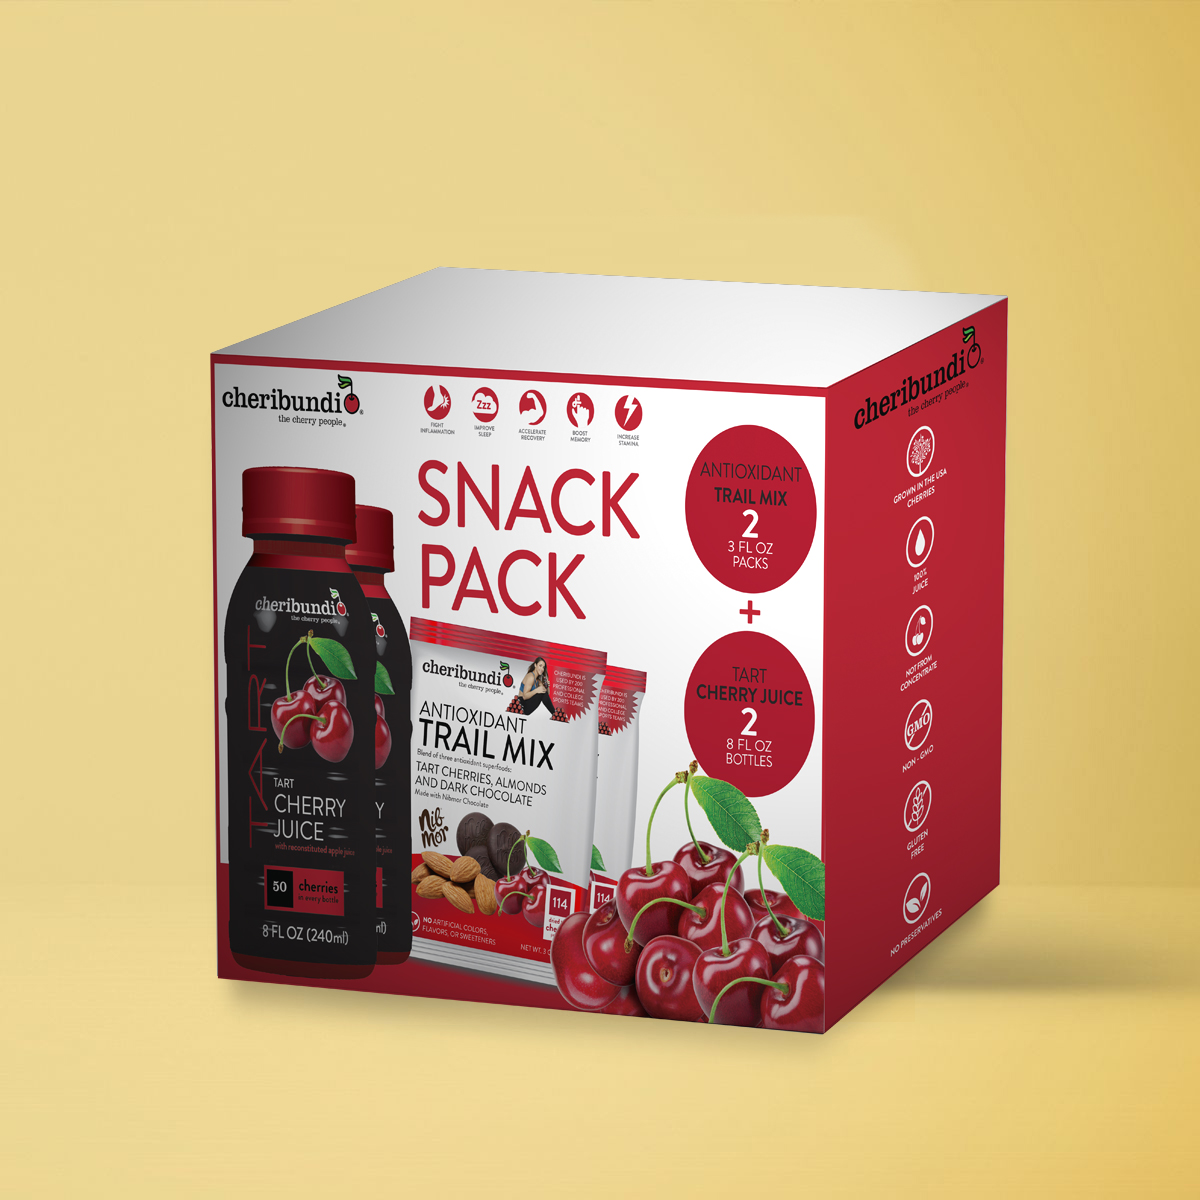 Portfolio-Cheribundi-Snack-Pack